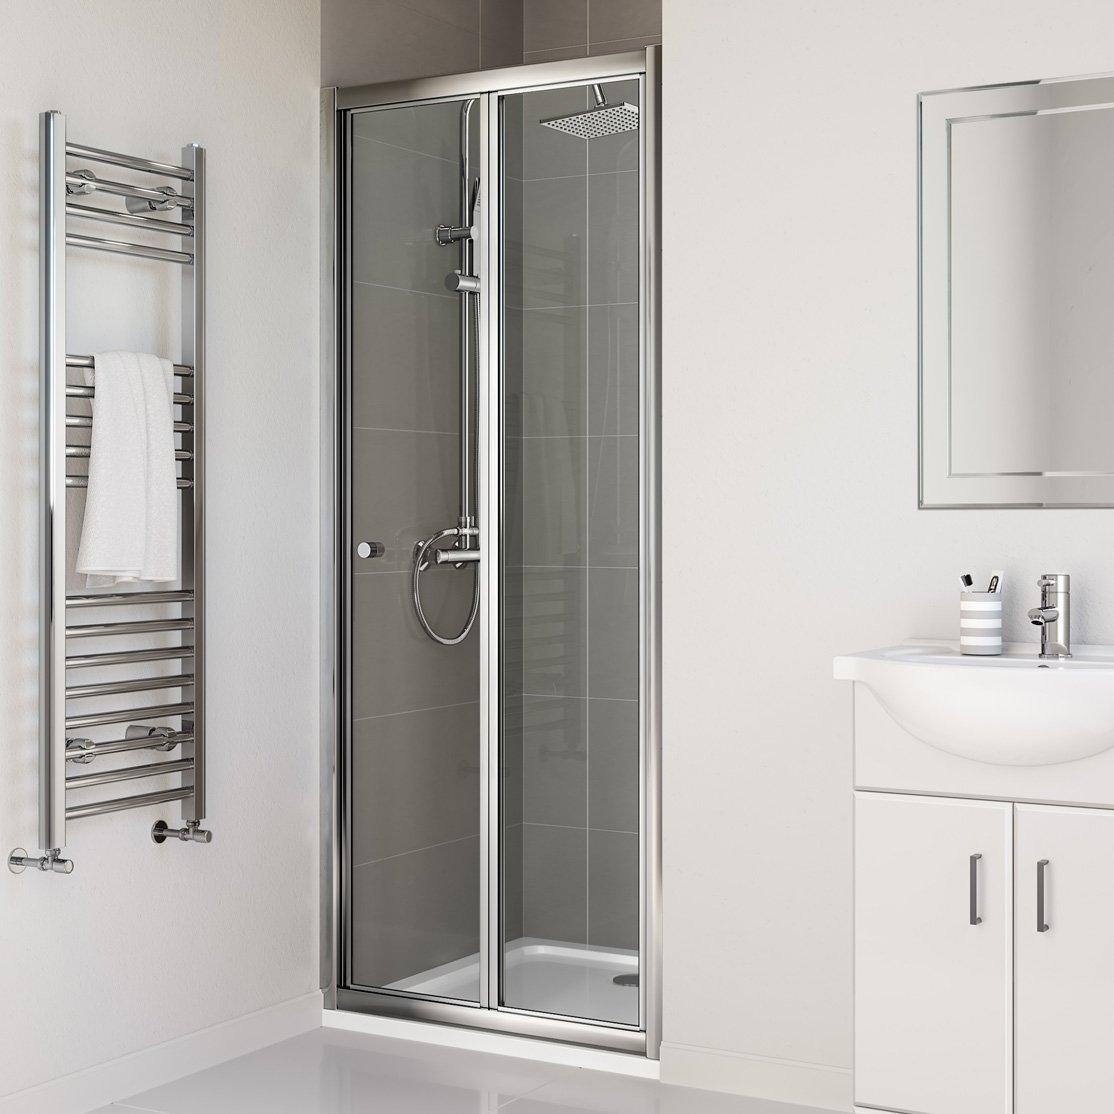 Ibathuk 800mm Bifold Glass Shower Enclosure Reversible Folding